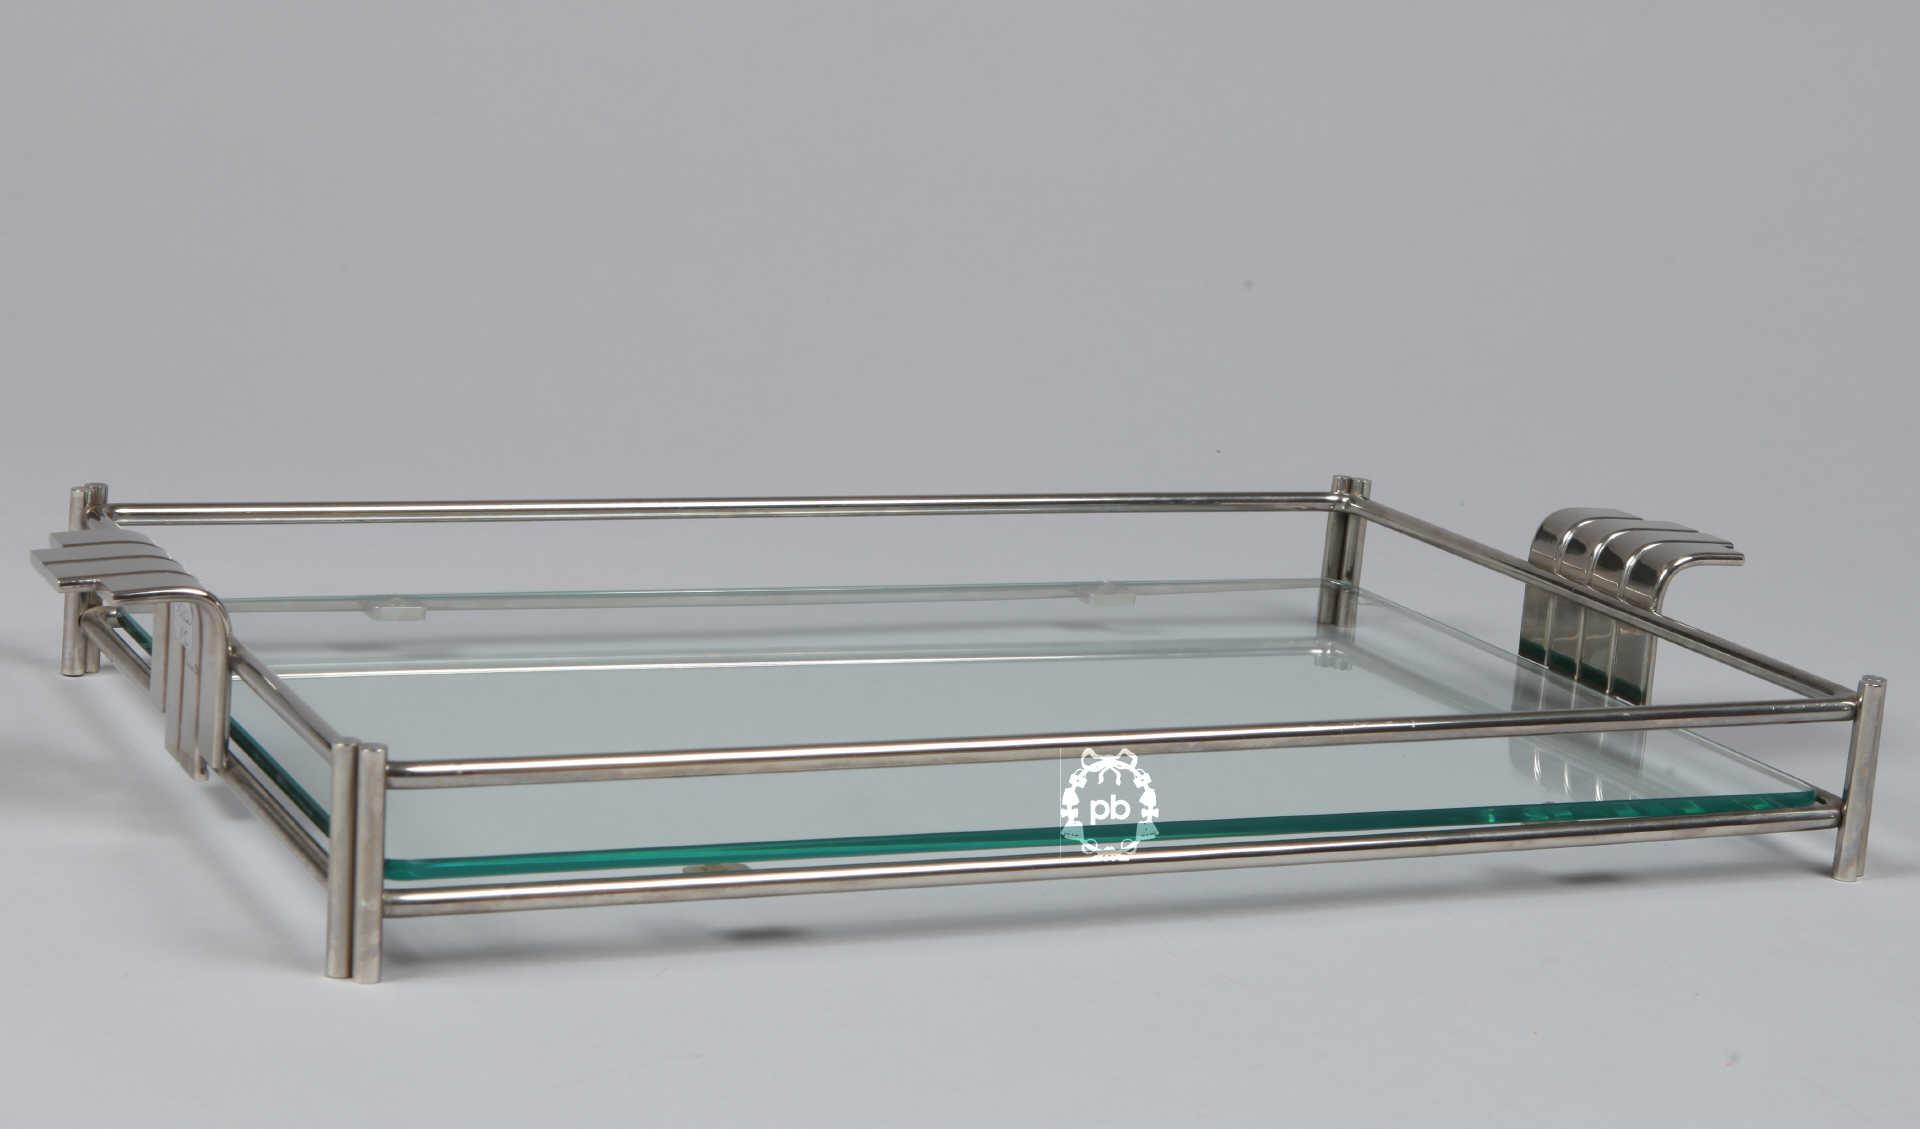 plateau de service en verre design en image. Black Bedroom Furniture Sets. Home Design Ideas